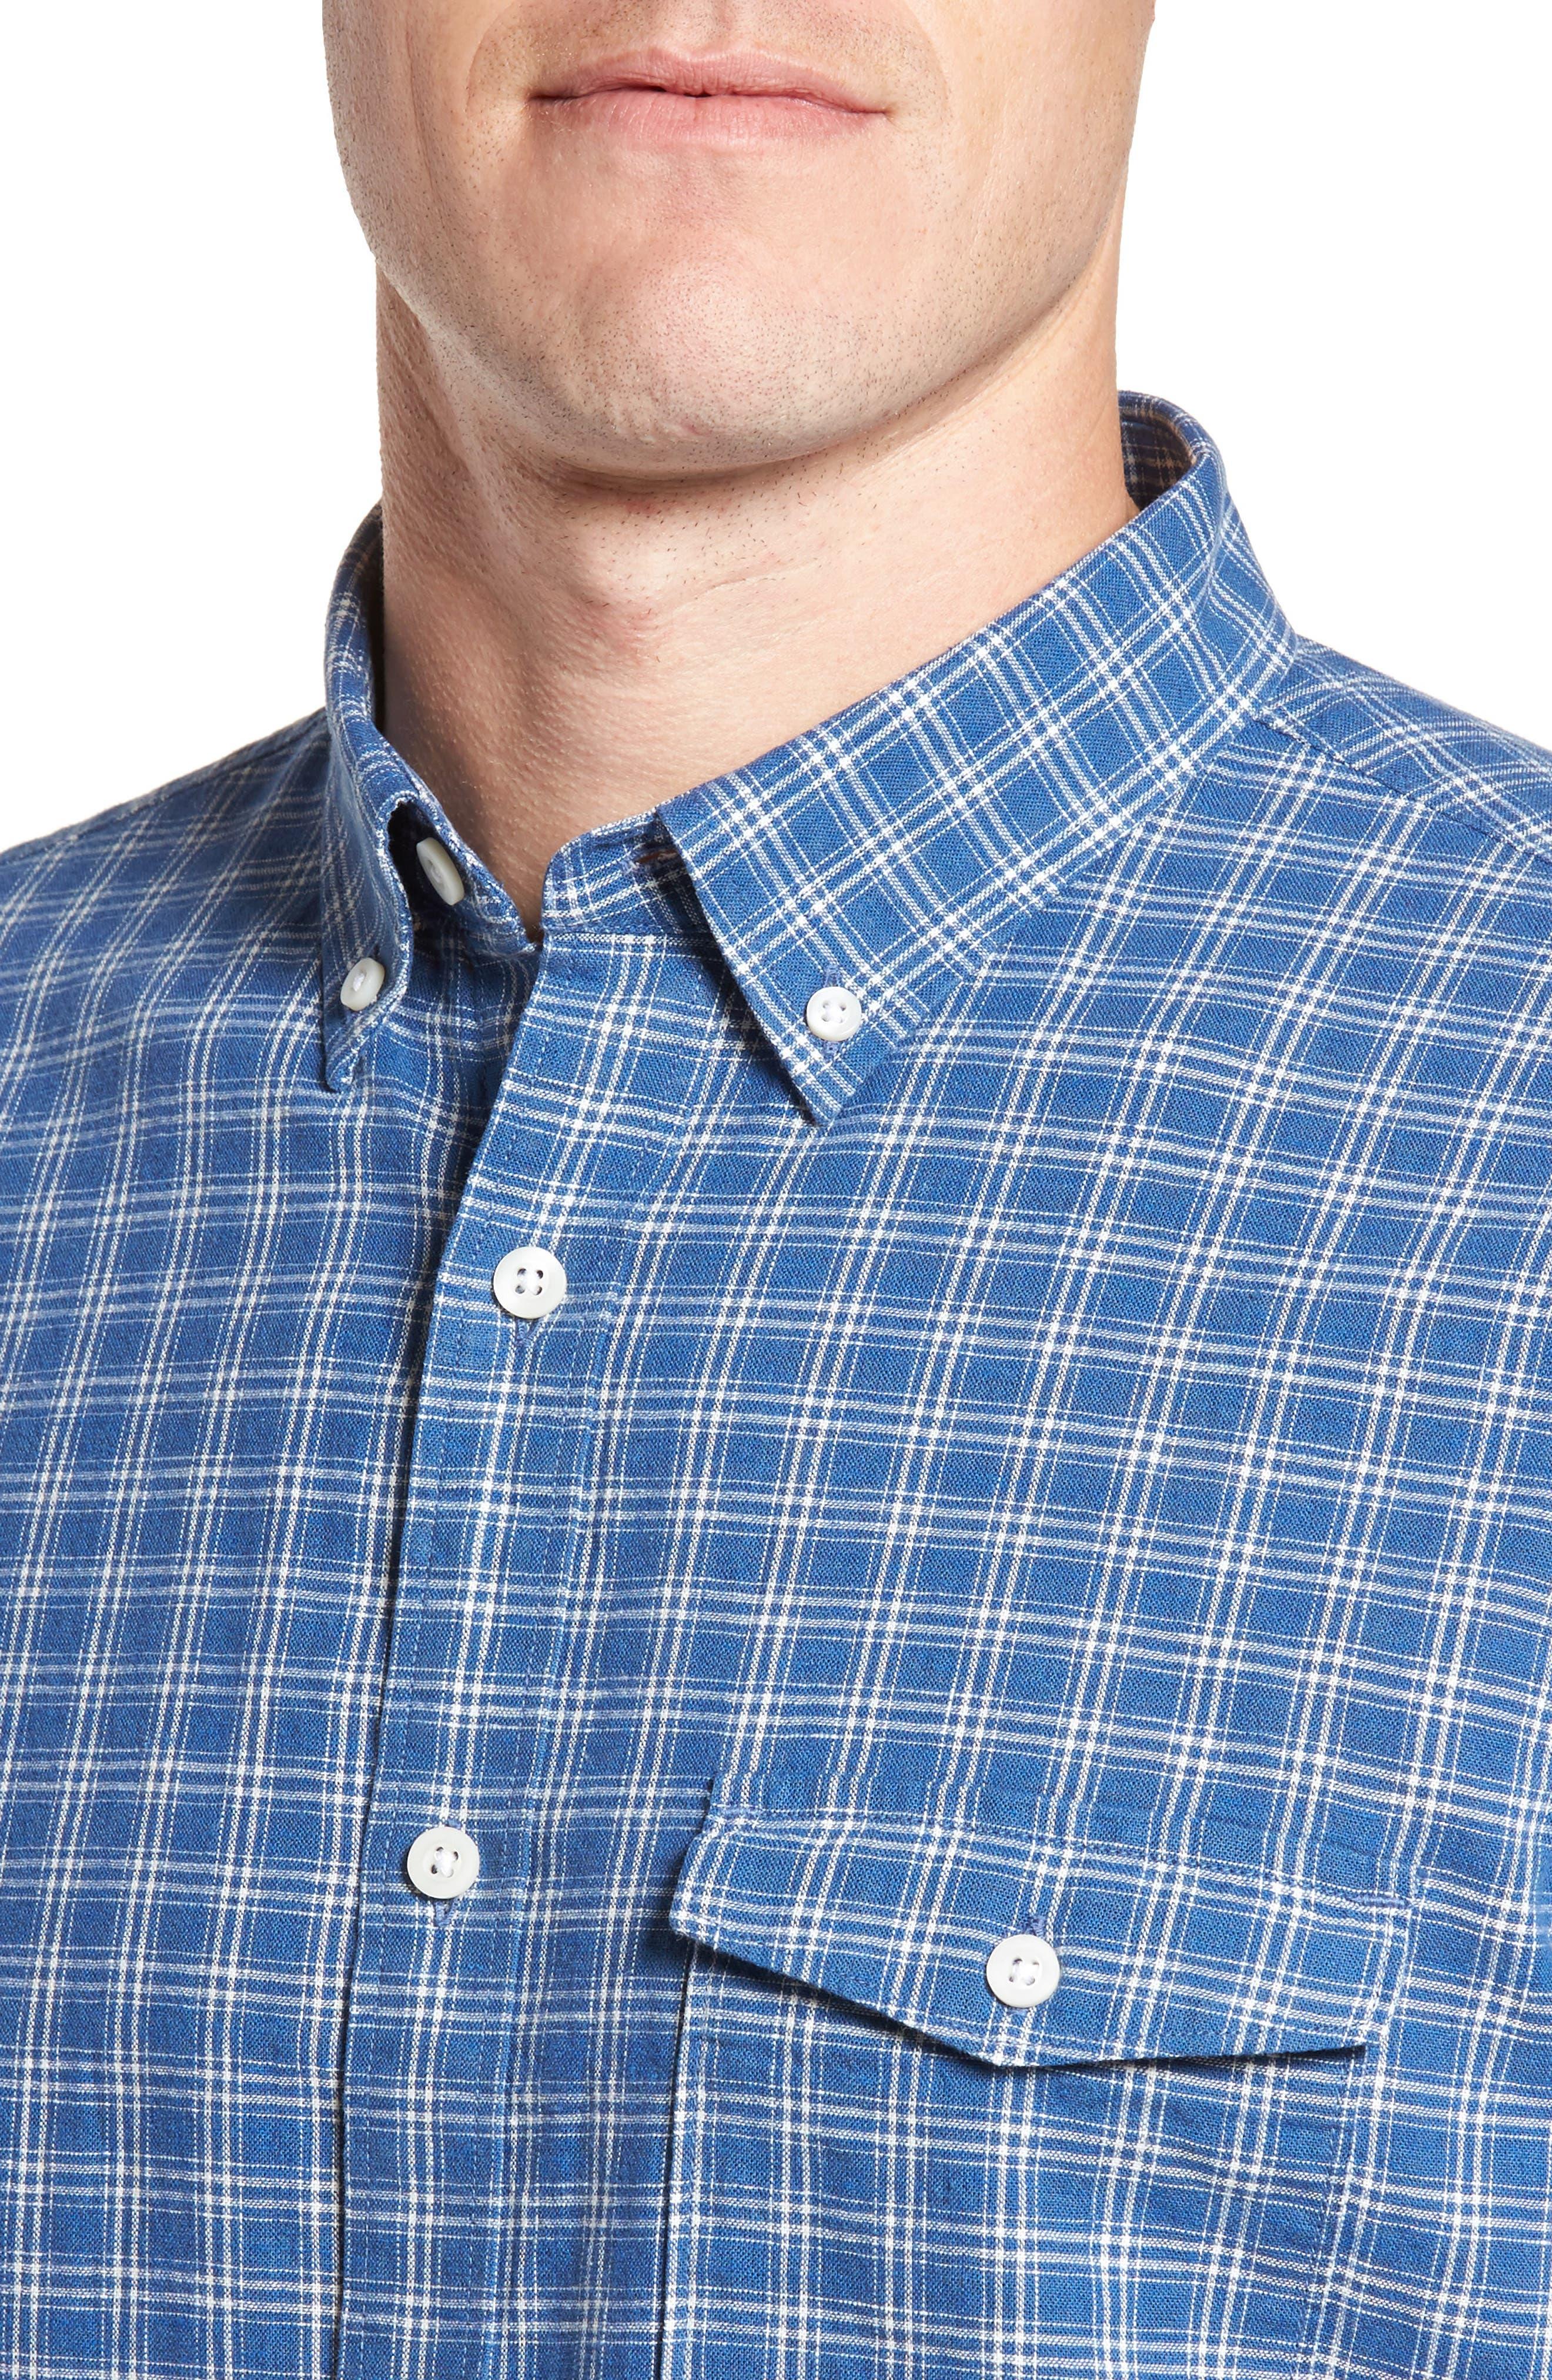 Ivy Trim Fit Check Sport Shirt,                             Alternate thumbnail 2, color,                             Blue Indigo White Plaid